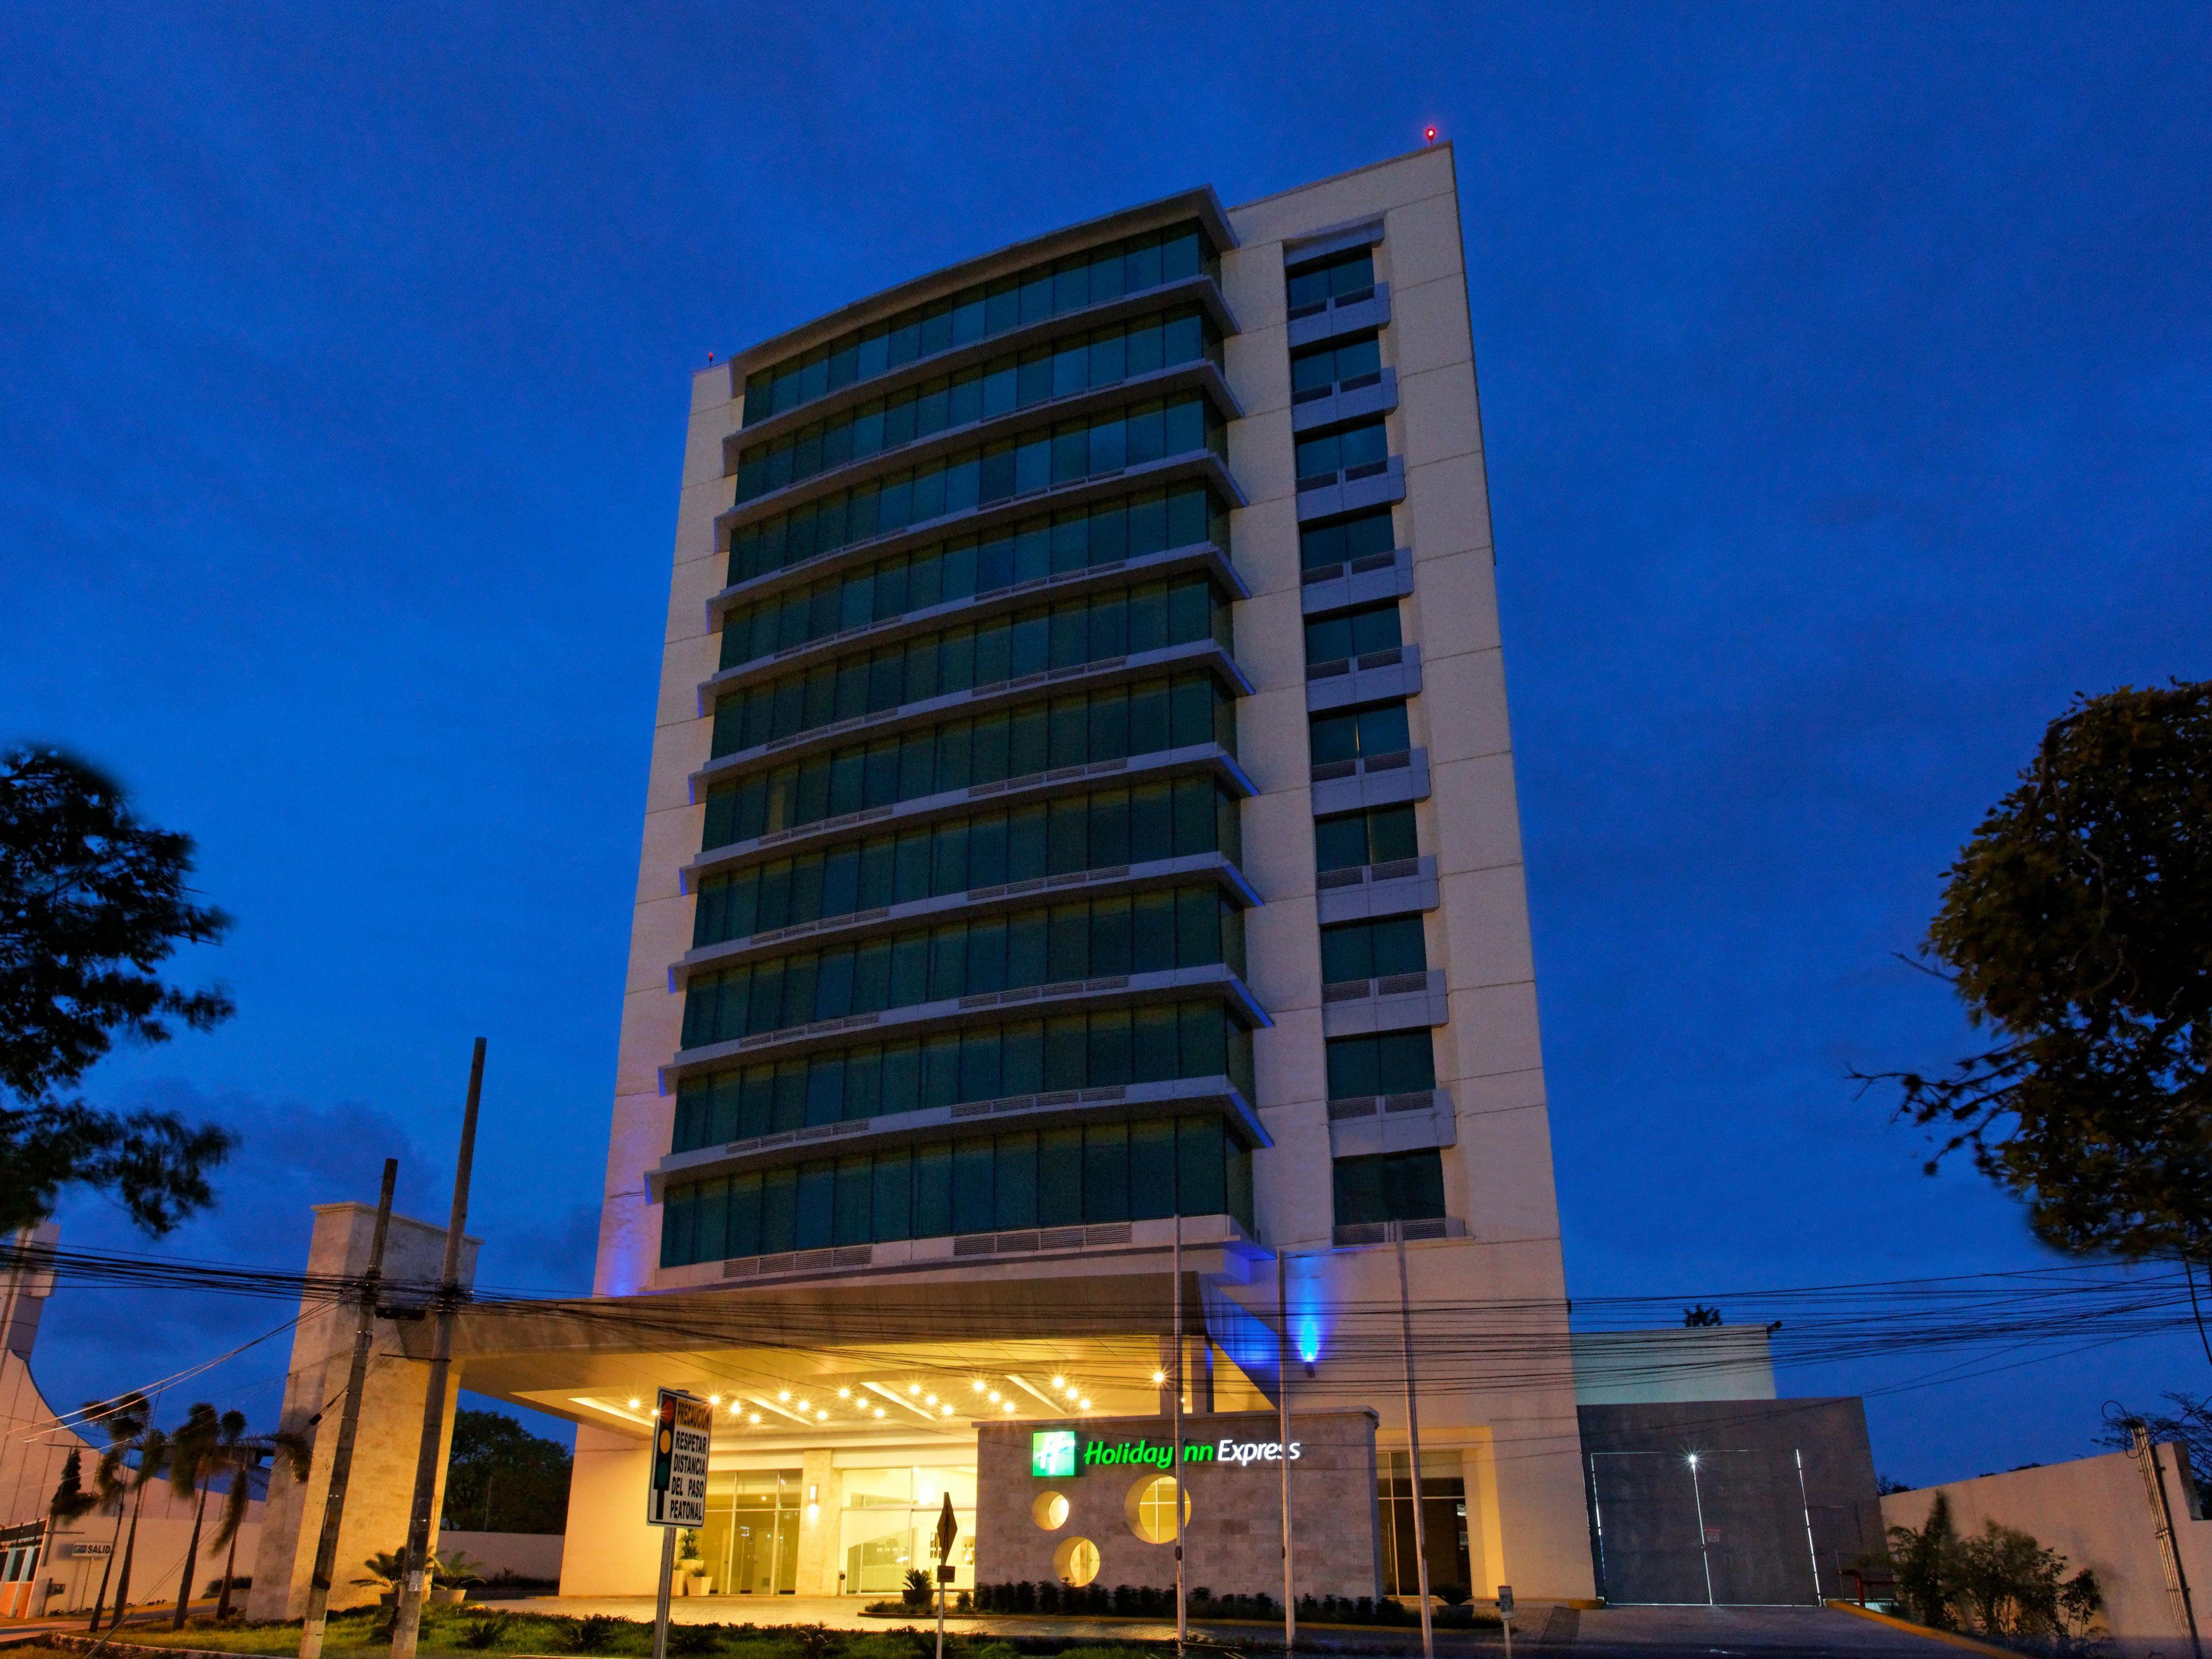 Resultado de imagen para HOTEL HOLIDAY INN EXPRESS SAN PEDRO SULA: